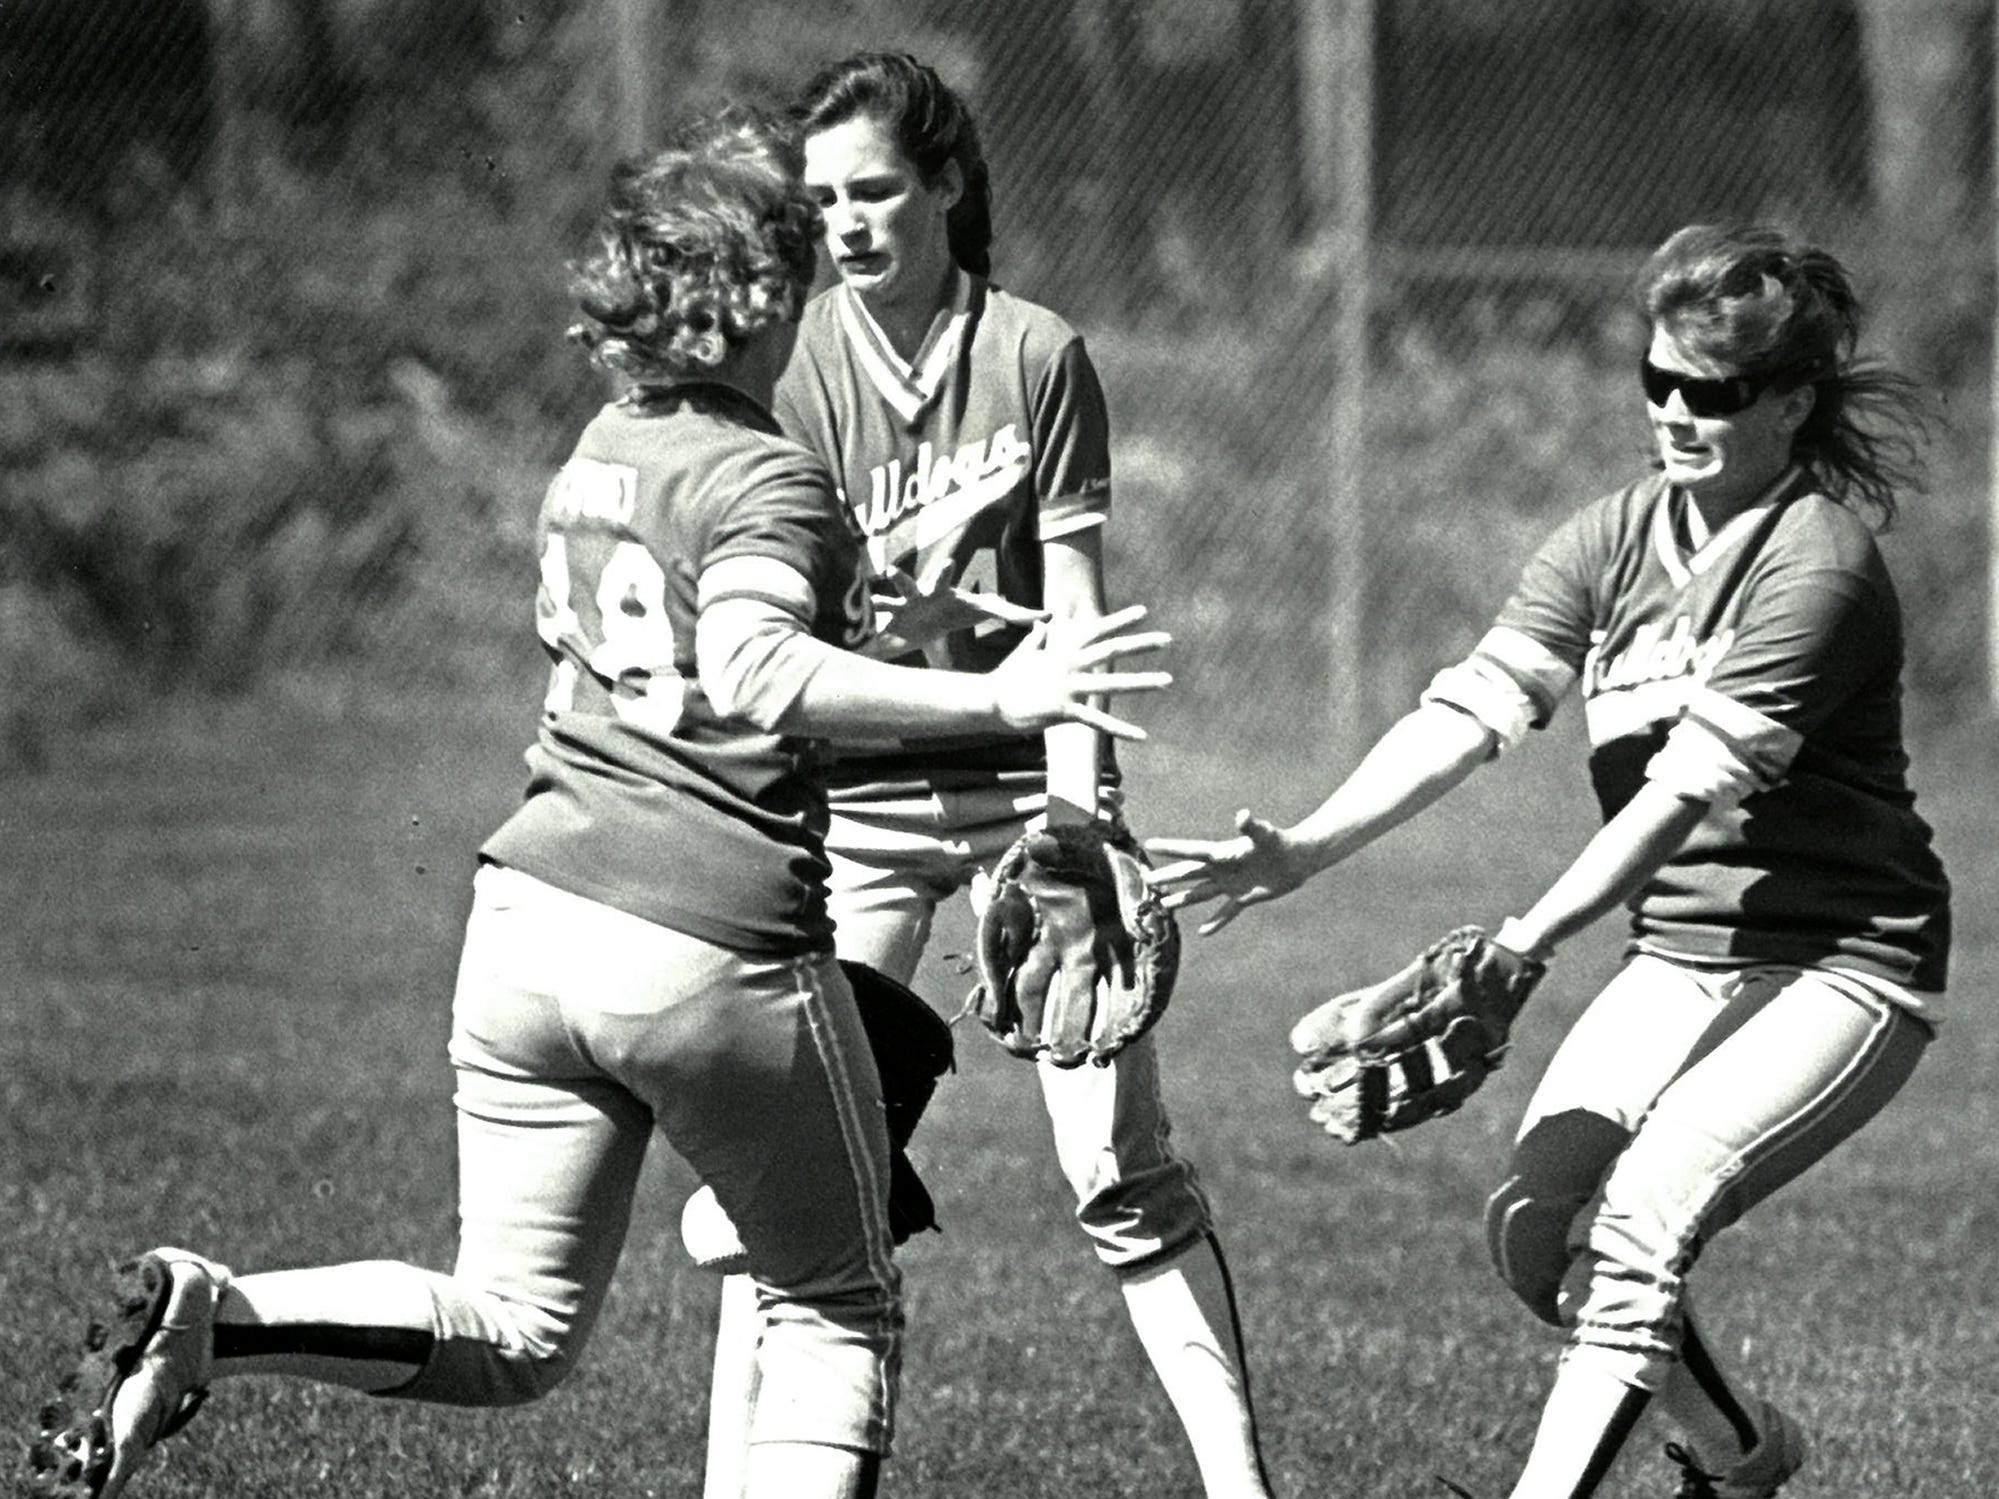 05/18/88NM Softball